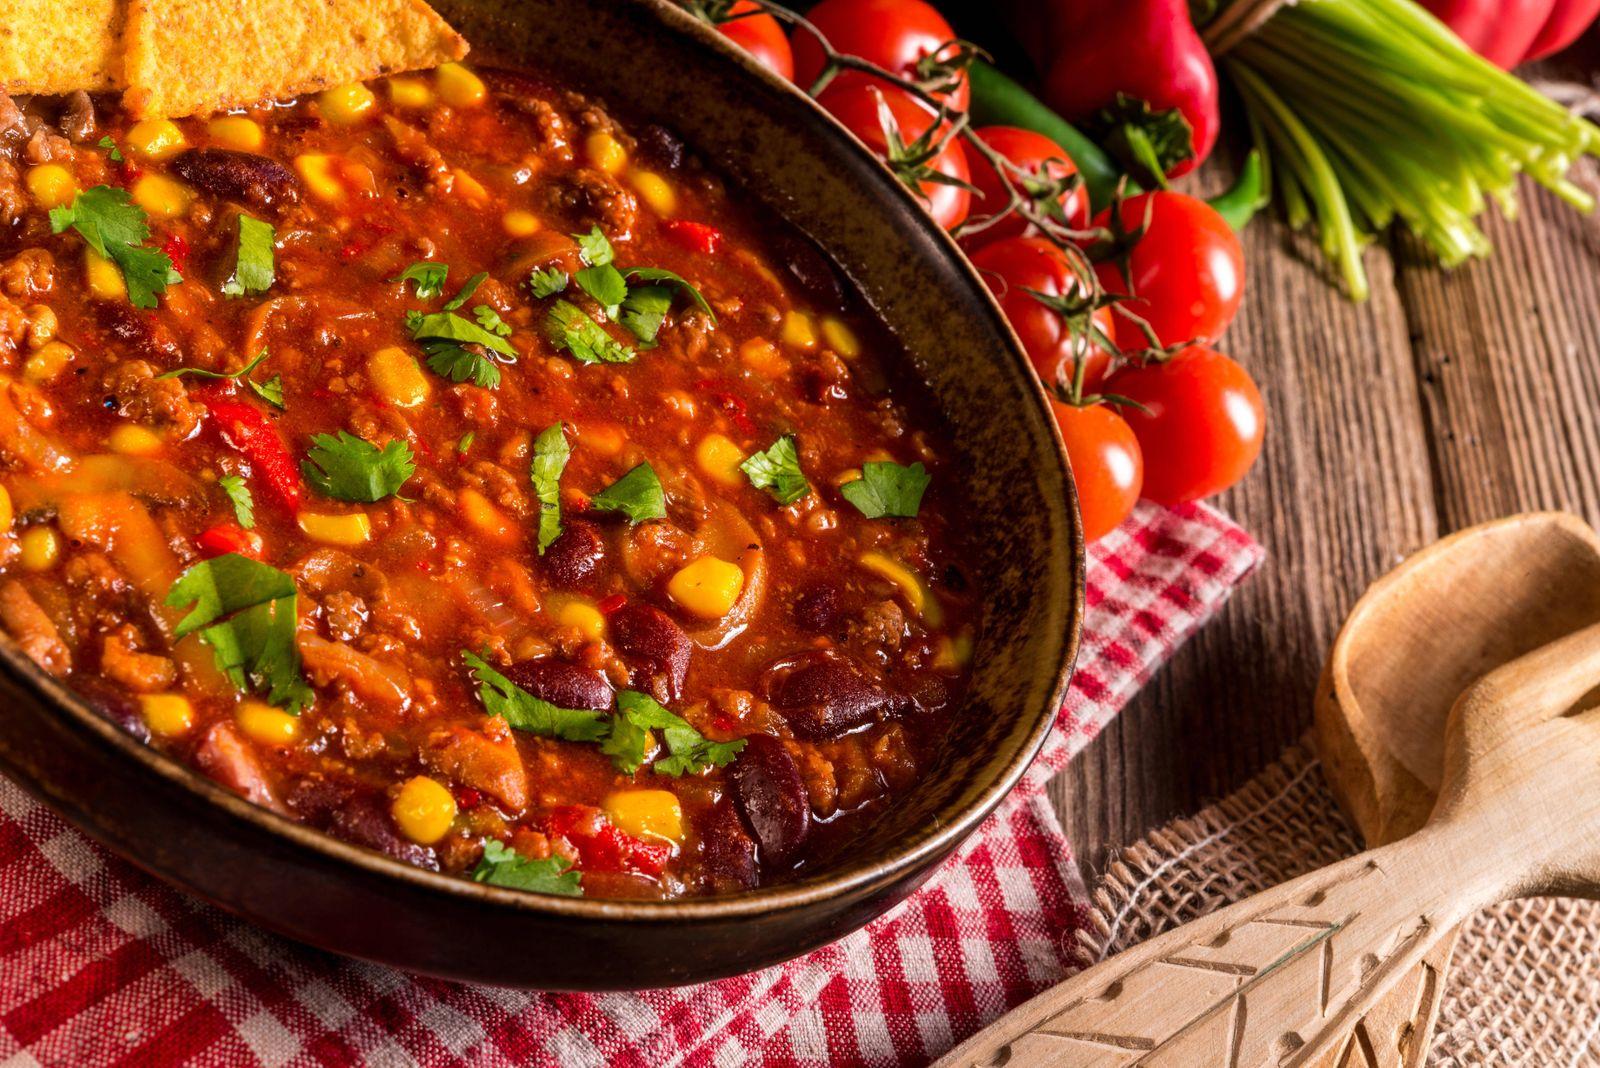 chili con carne PUBLICATIONxINxGERxSUIxAUTxONLY Copyright xDar1930x Panthermedia14021609